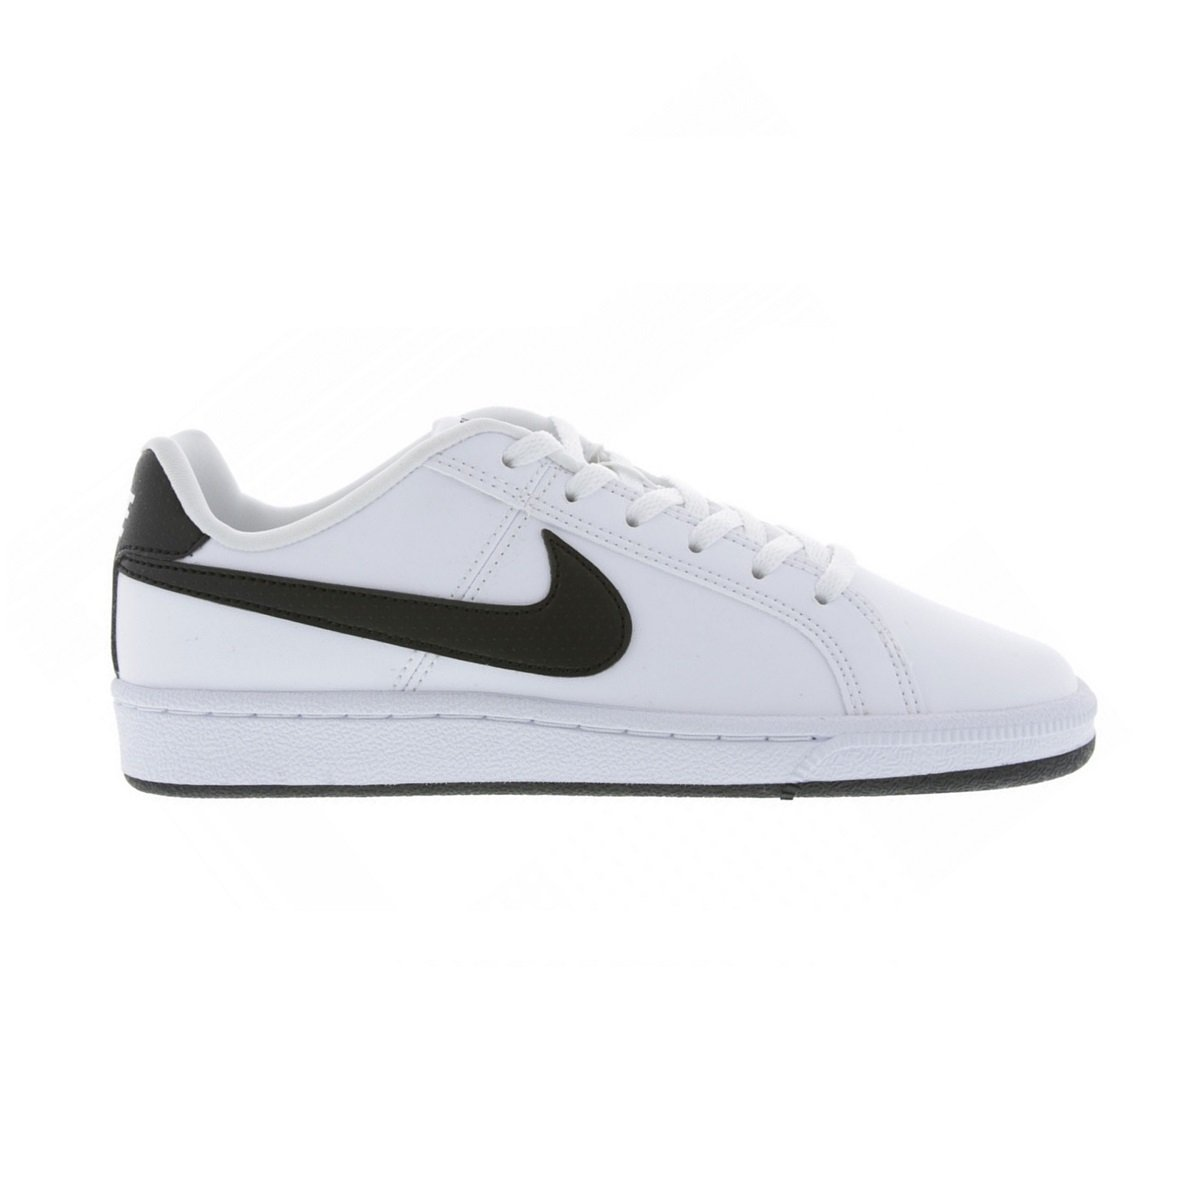 Tênis Juvenil Nike Court Royale SL AV3164-101 - Branco Preto - Botas ... b9395634d5281